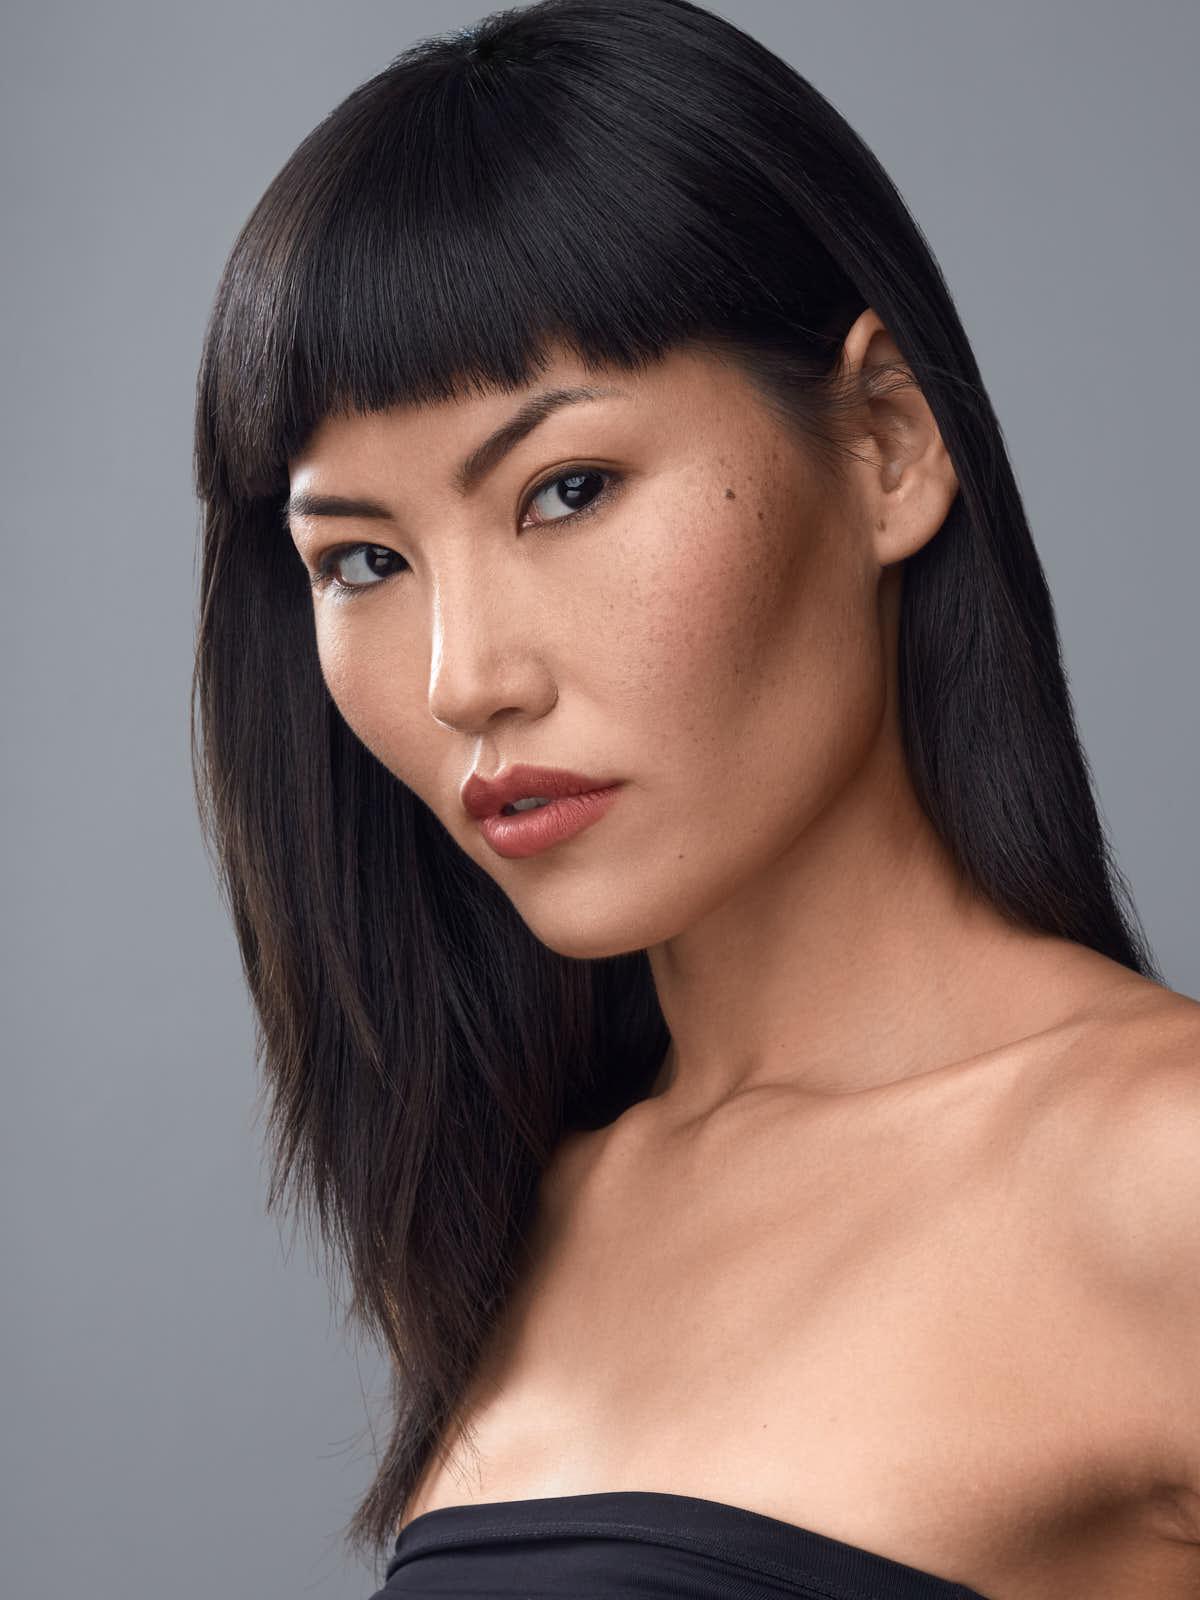 sce-agency-female-model-tia-b-1aa